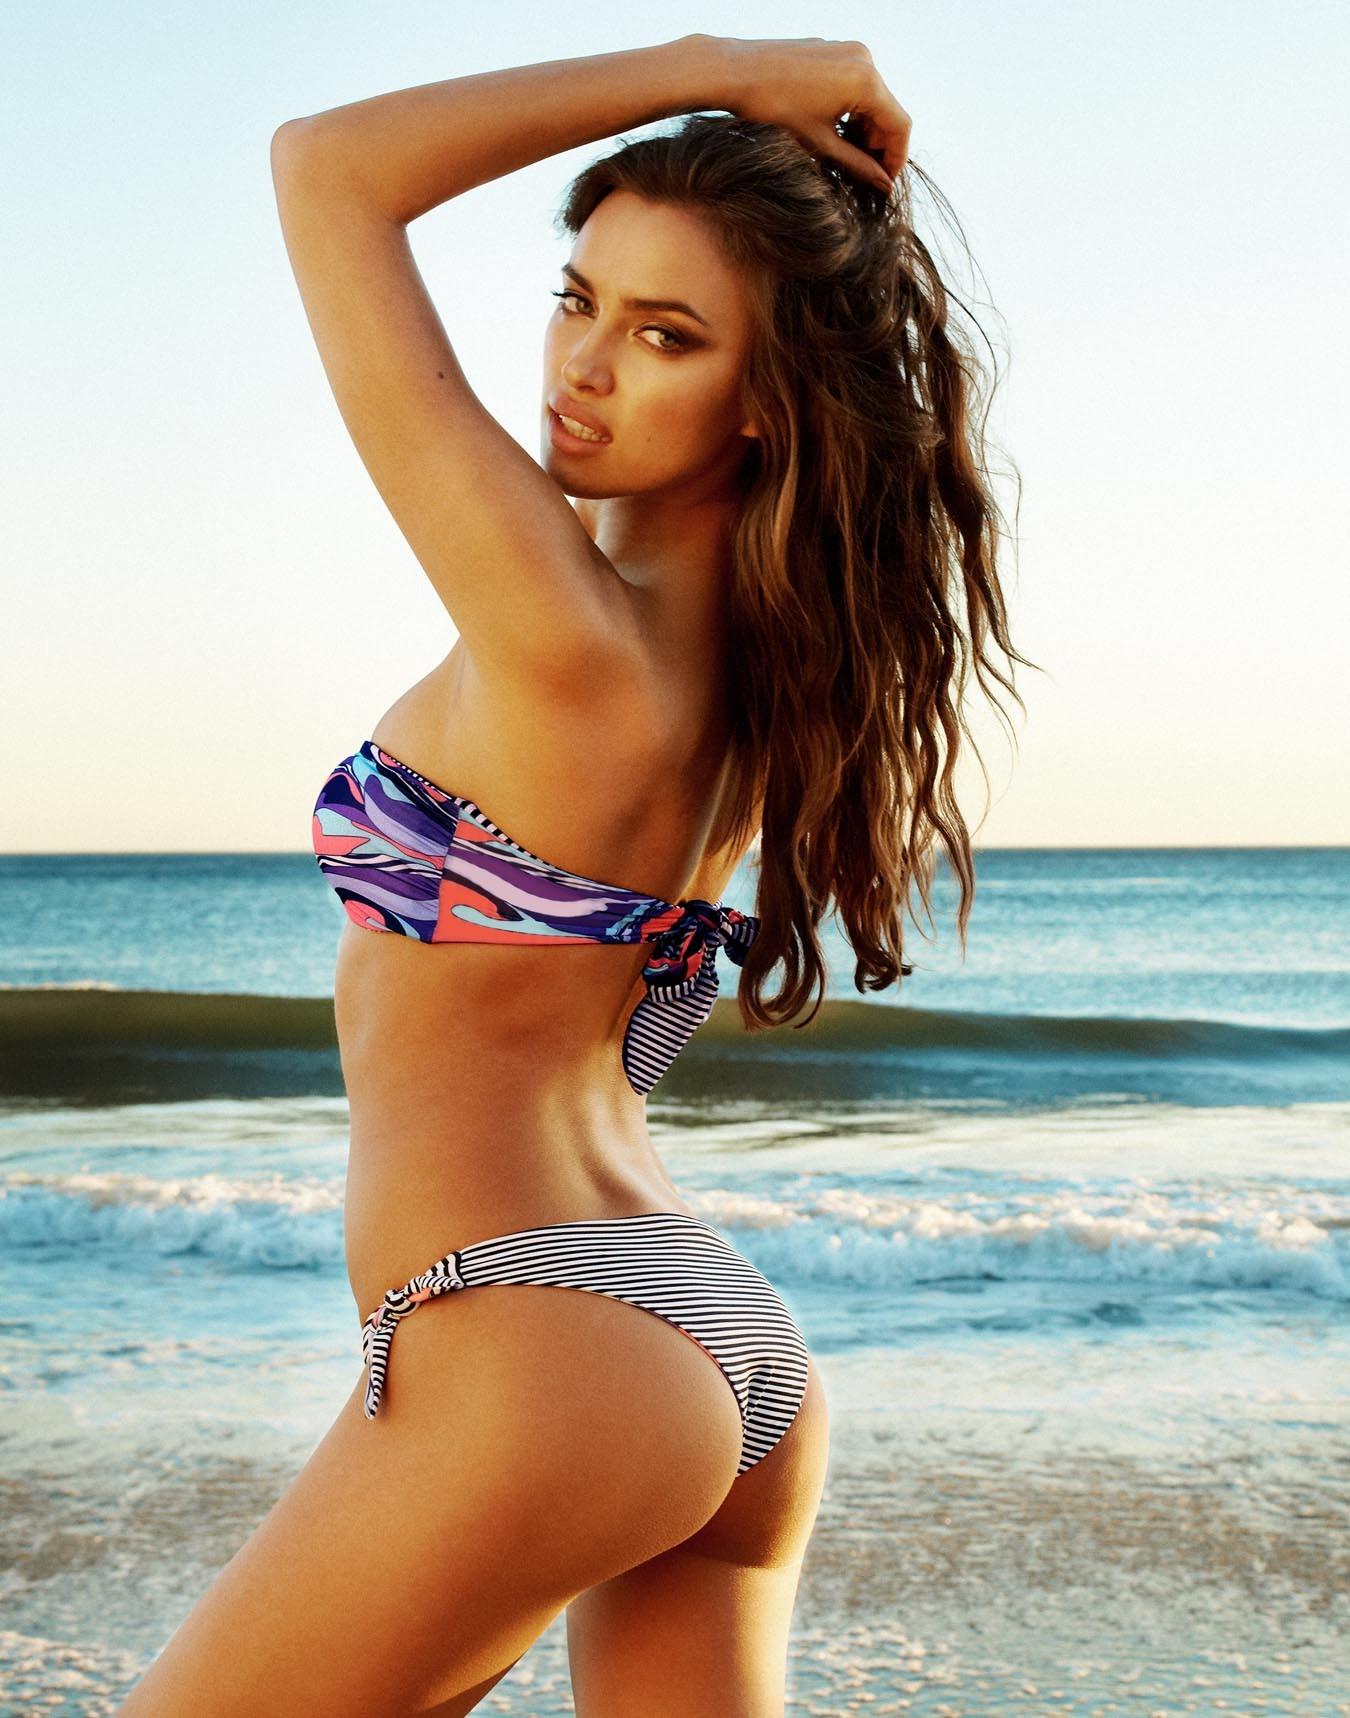 Irina-Shayk-Beach-Bunny-Photoshoot-37